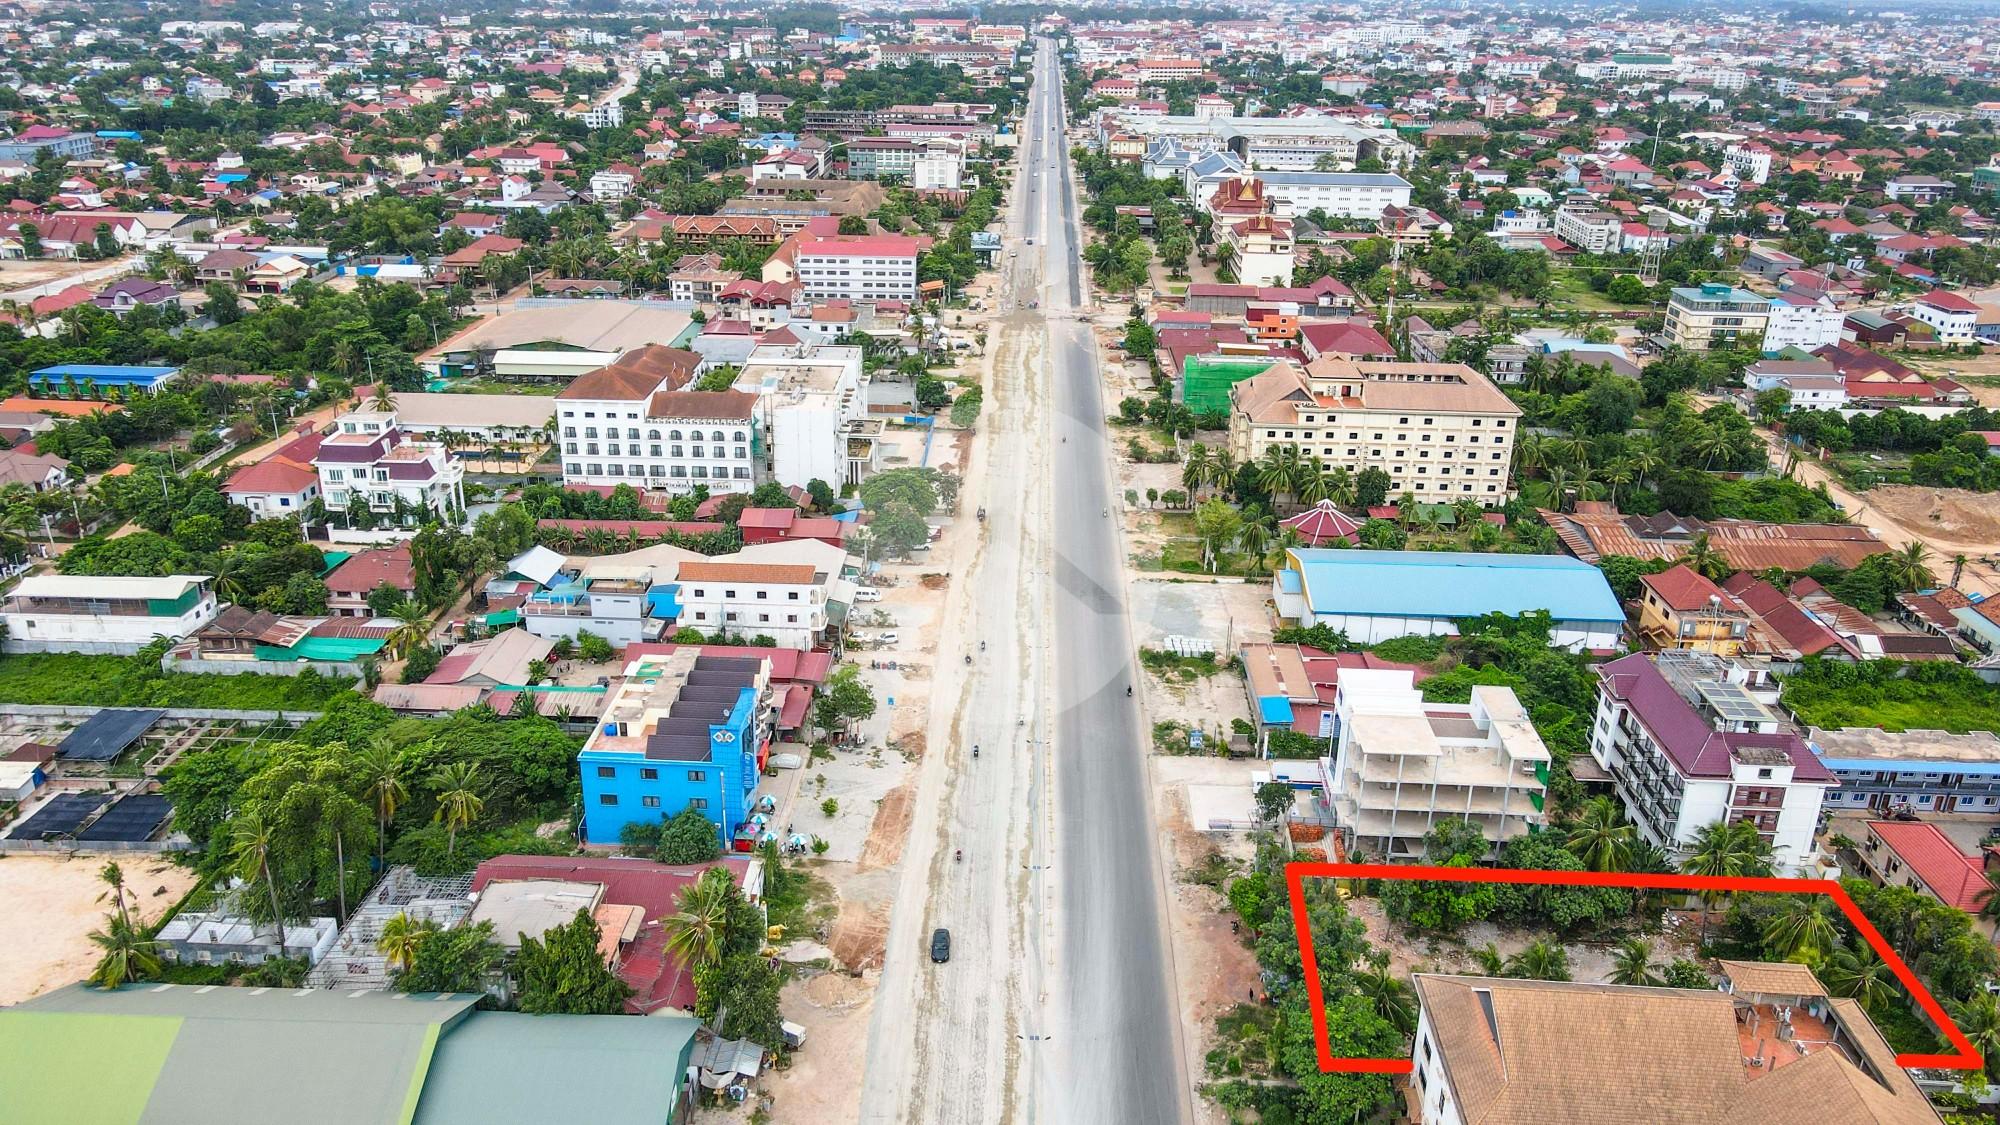 1825 sqm Land For Sale - Svay Dangkum, Siem Reap